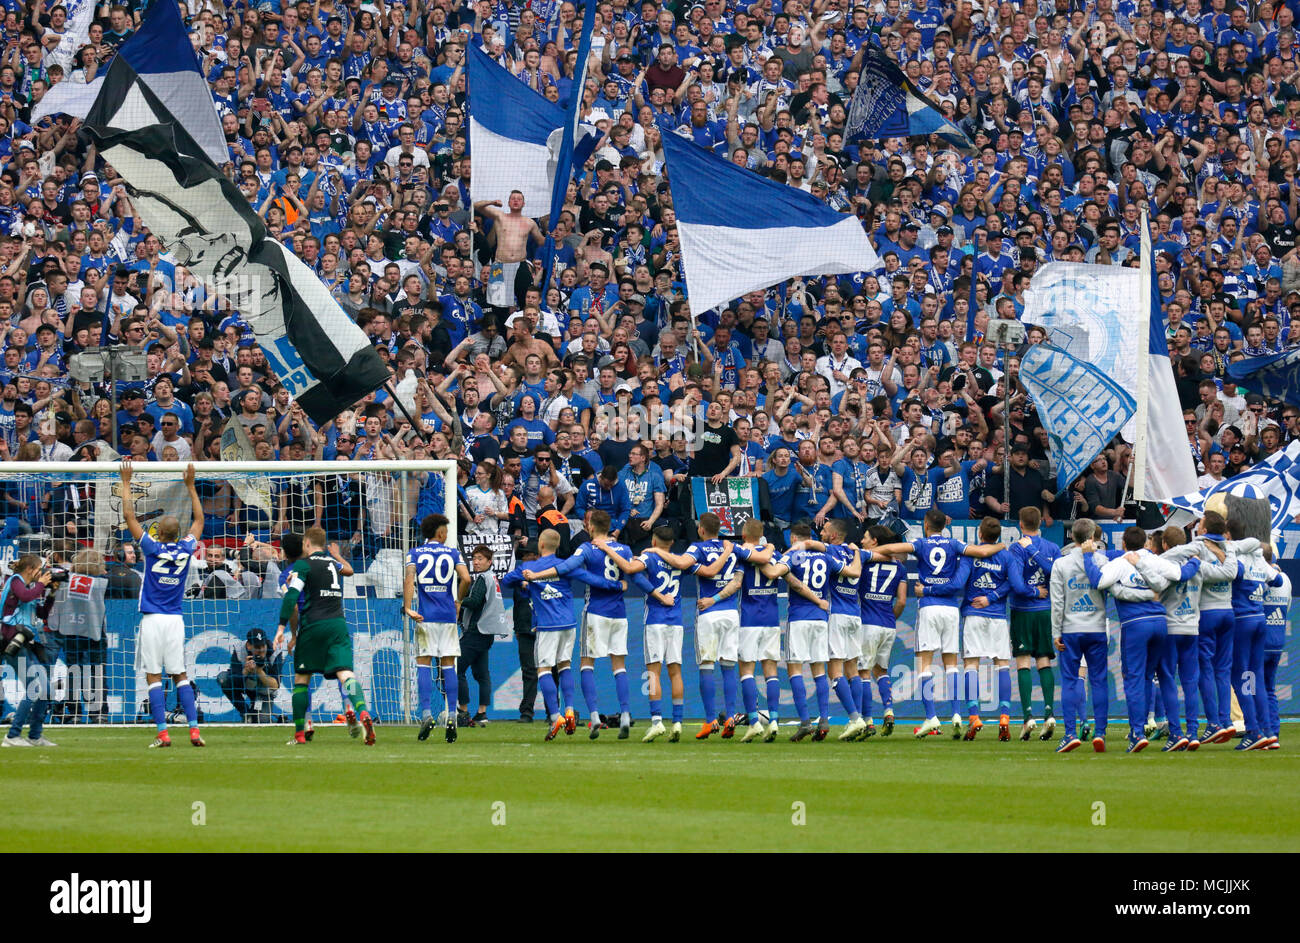 Arena On Schalke Stock Photos & Arena On Schalke Stock